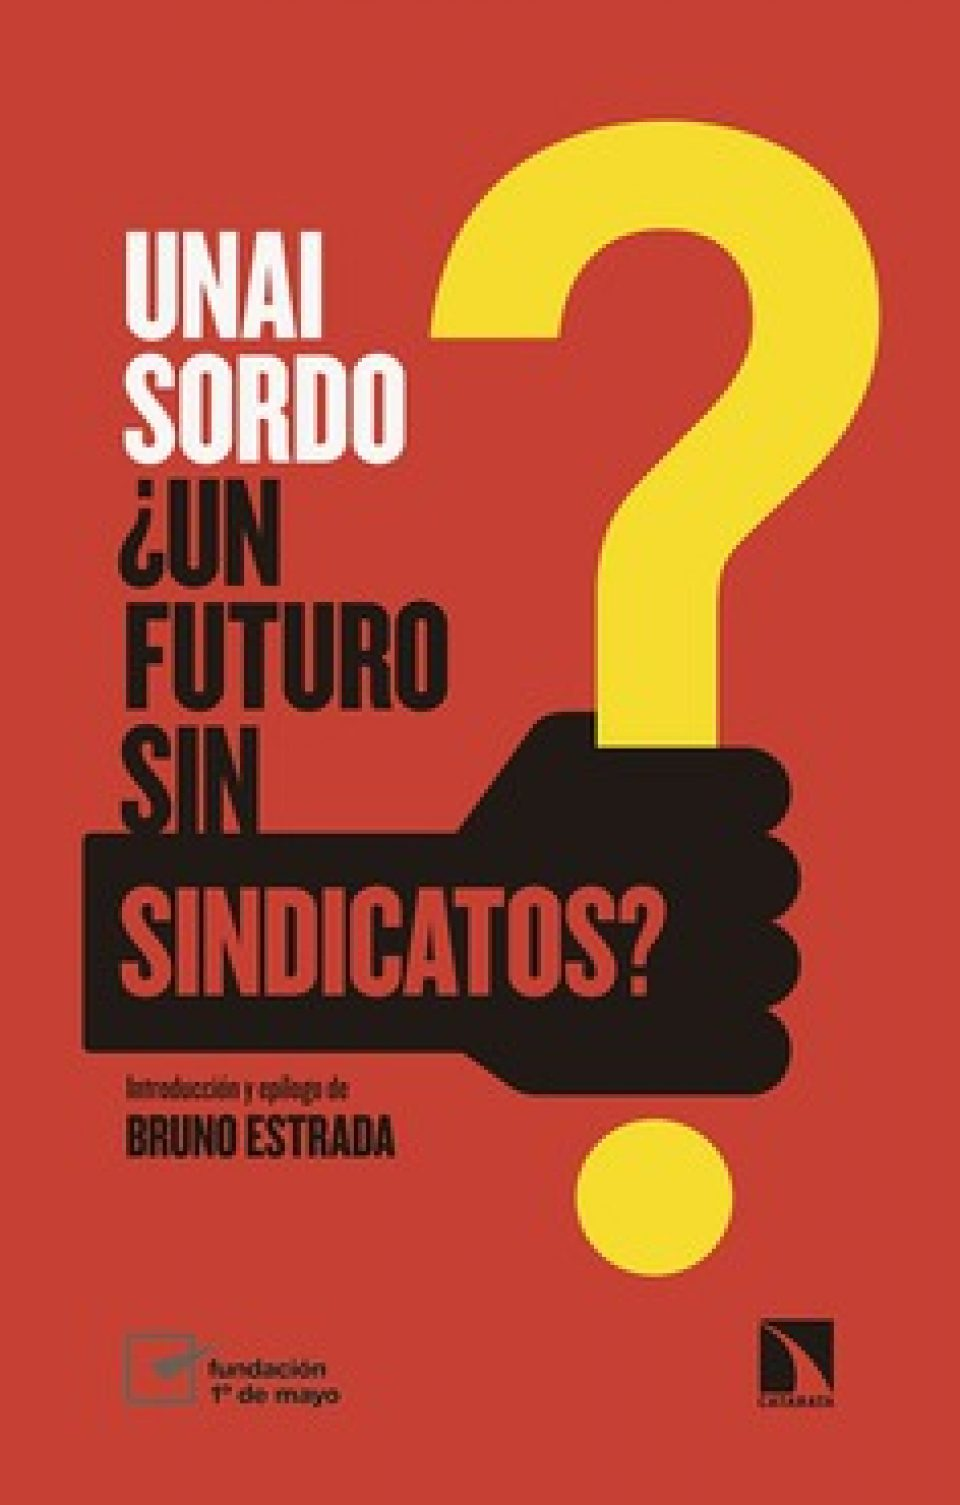 http://unaisordo.com/wp-content/uploads/2019/07/futuro-sin-960x1505_c.jpg